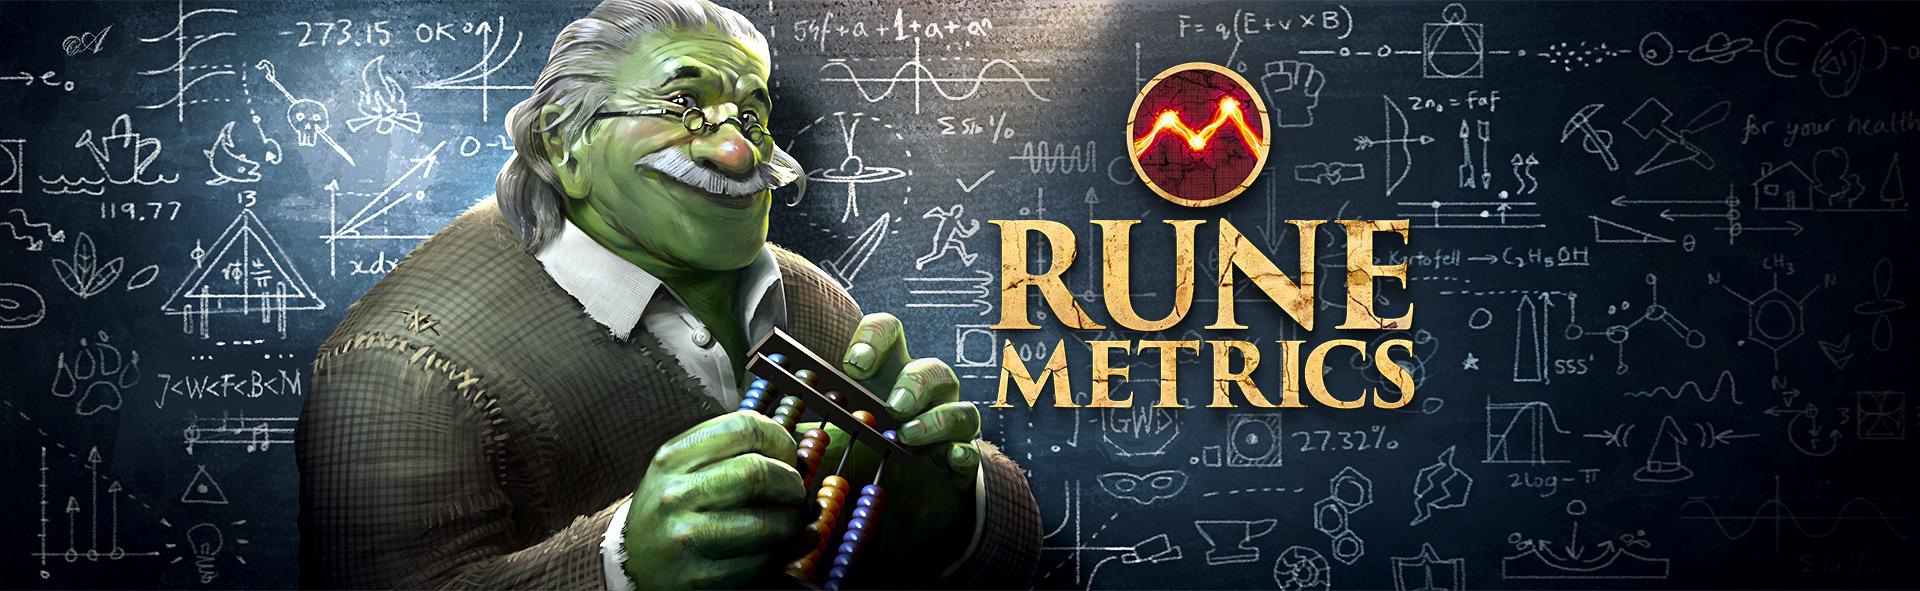 RuneMetrics Pro